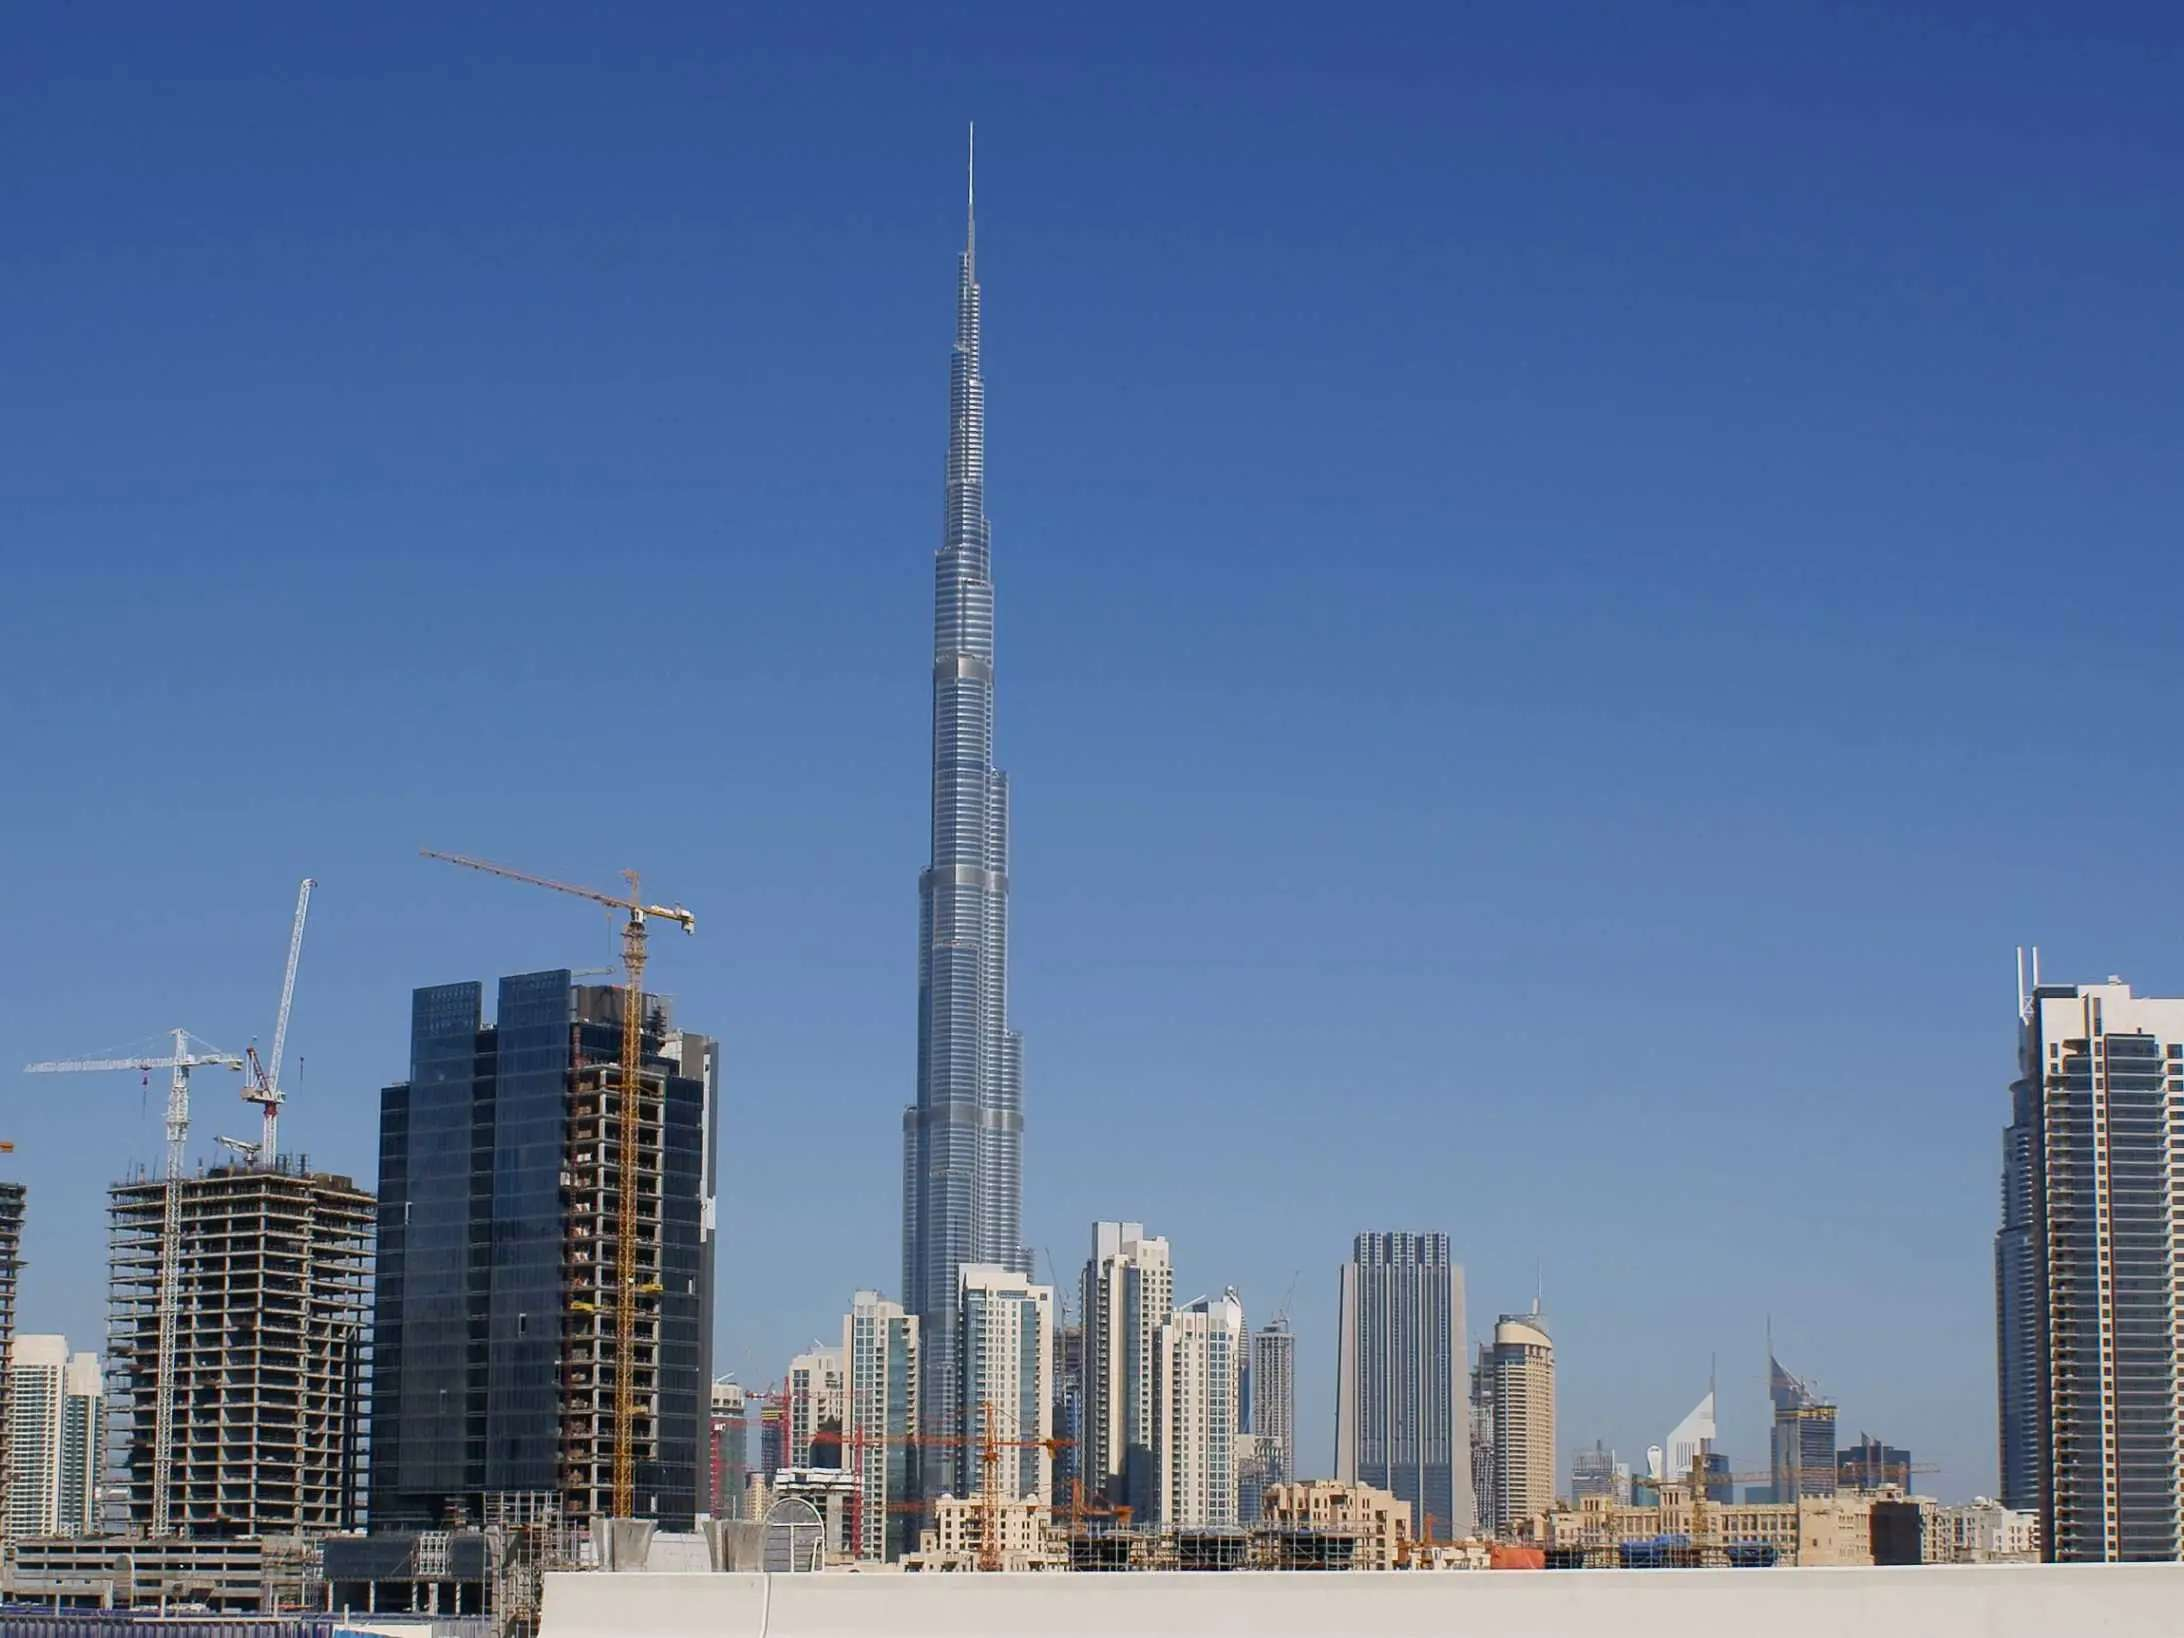 Dubai, UAE, features strikingly innovative architecture, like the 160-story-tall Burj Khalifa, the tallest building on earth.